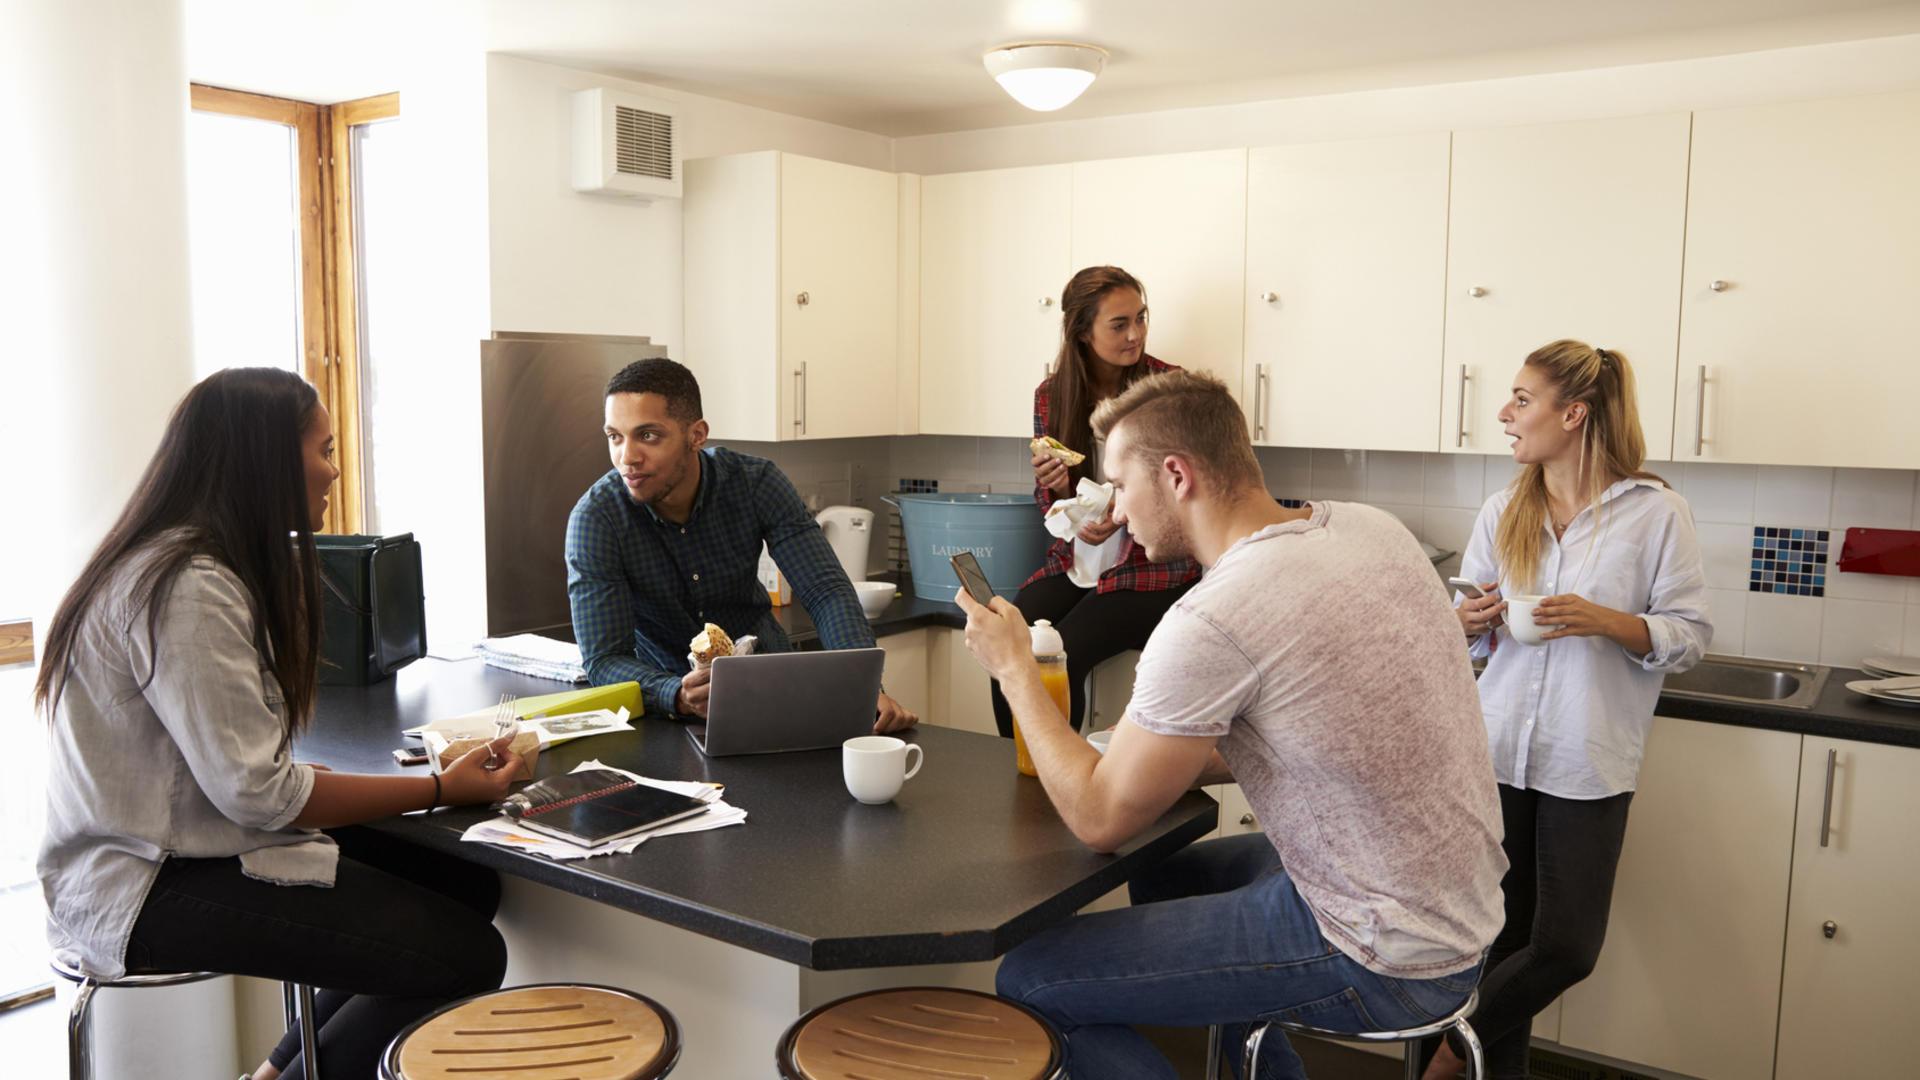 Les diff rents types de logements tudiants campus france for Foyer international des etudiantes